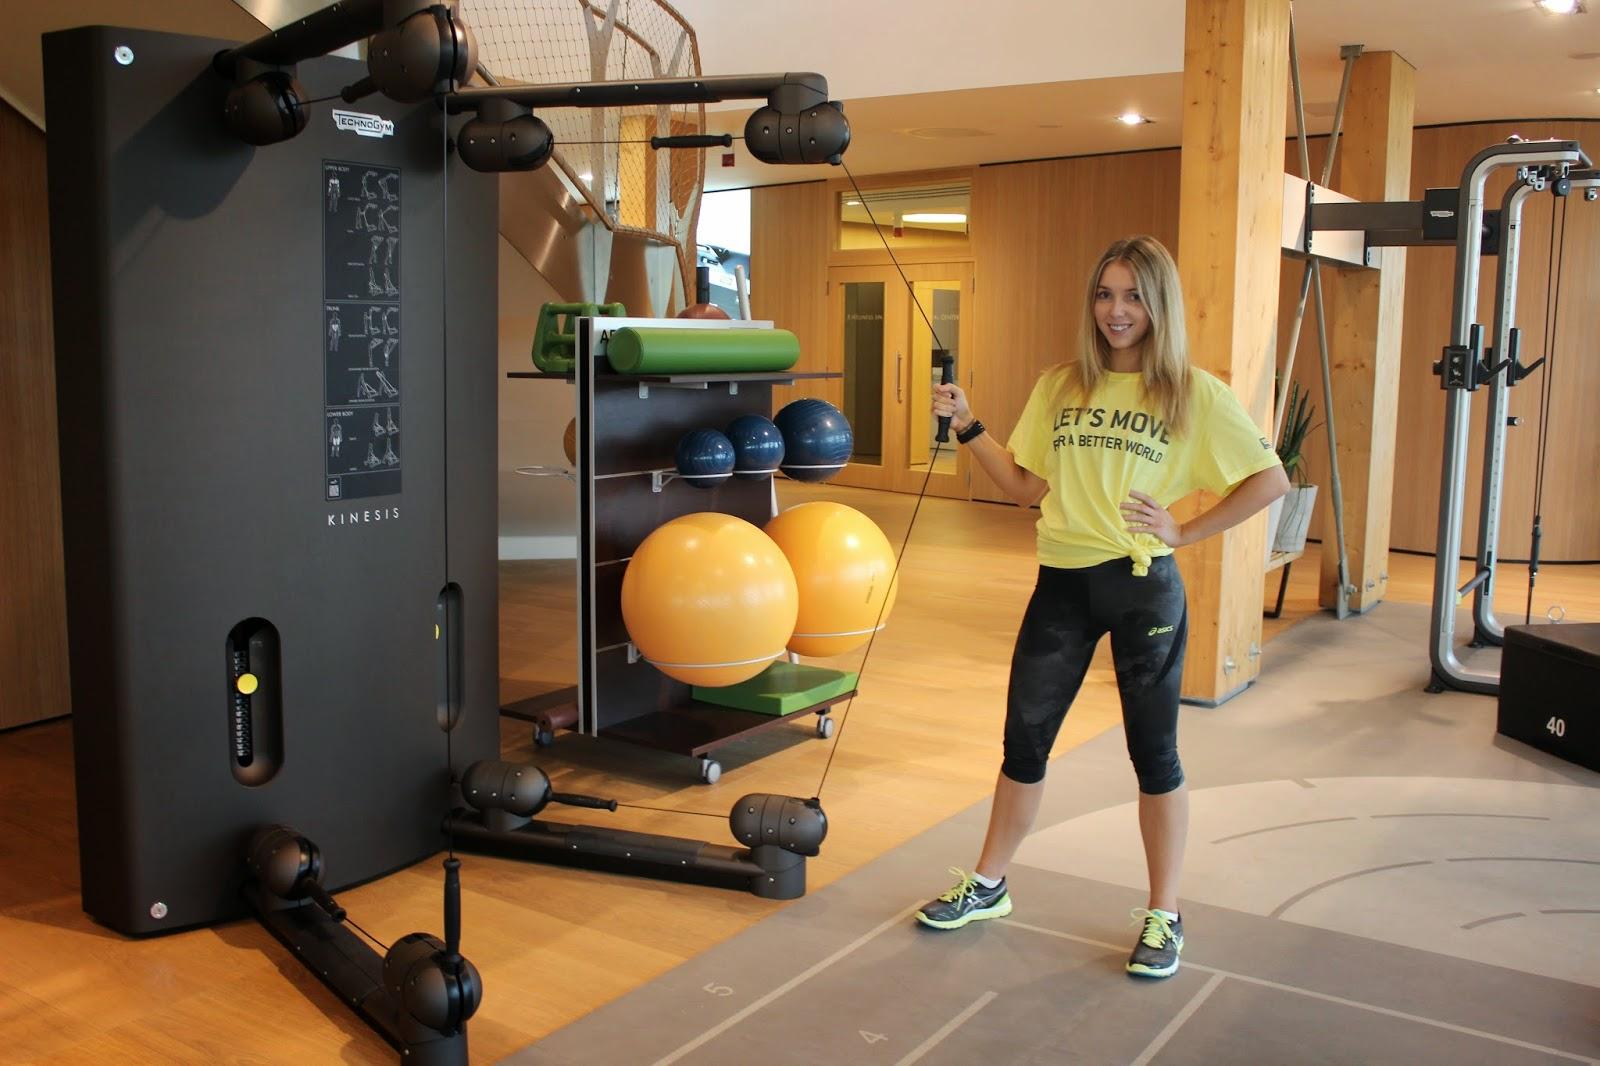 Technogym Wellness Village Gym Workout Kinesis Natalie